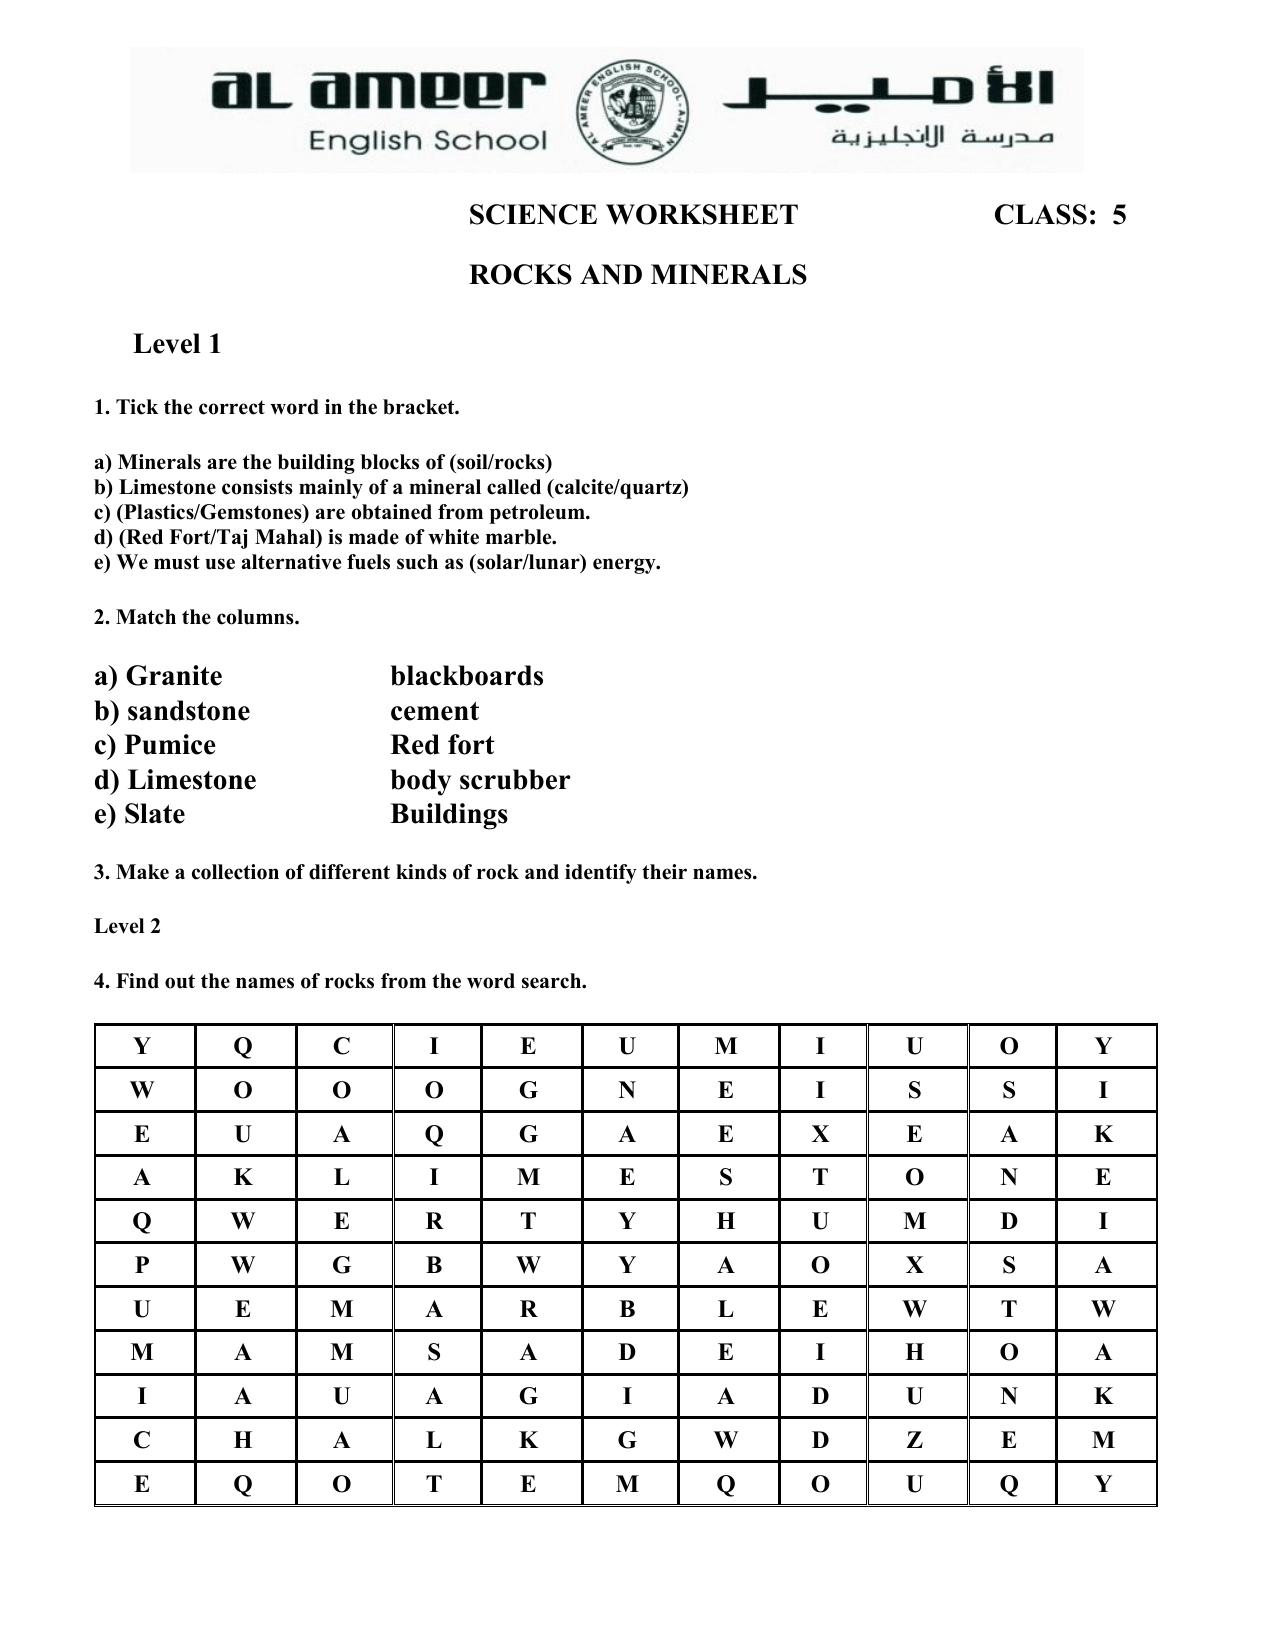 R4jnd7 Hmw Science Worksheet 5